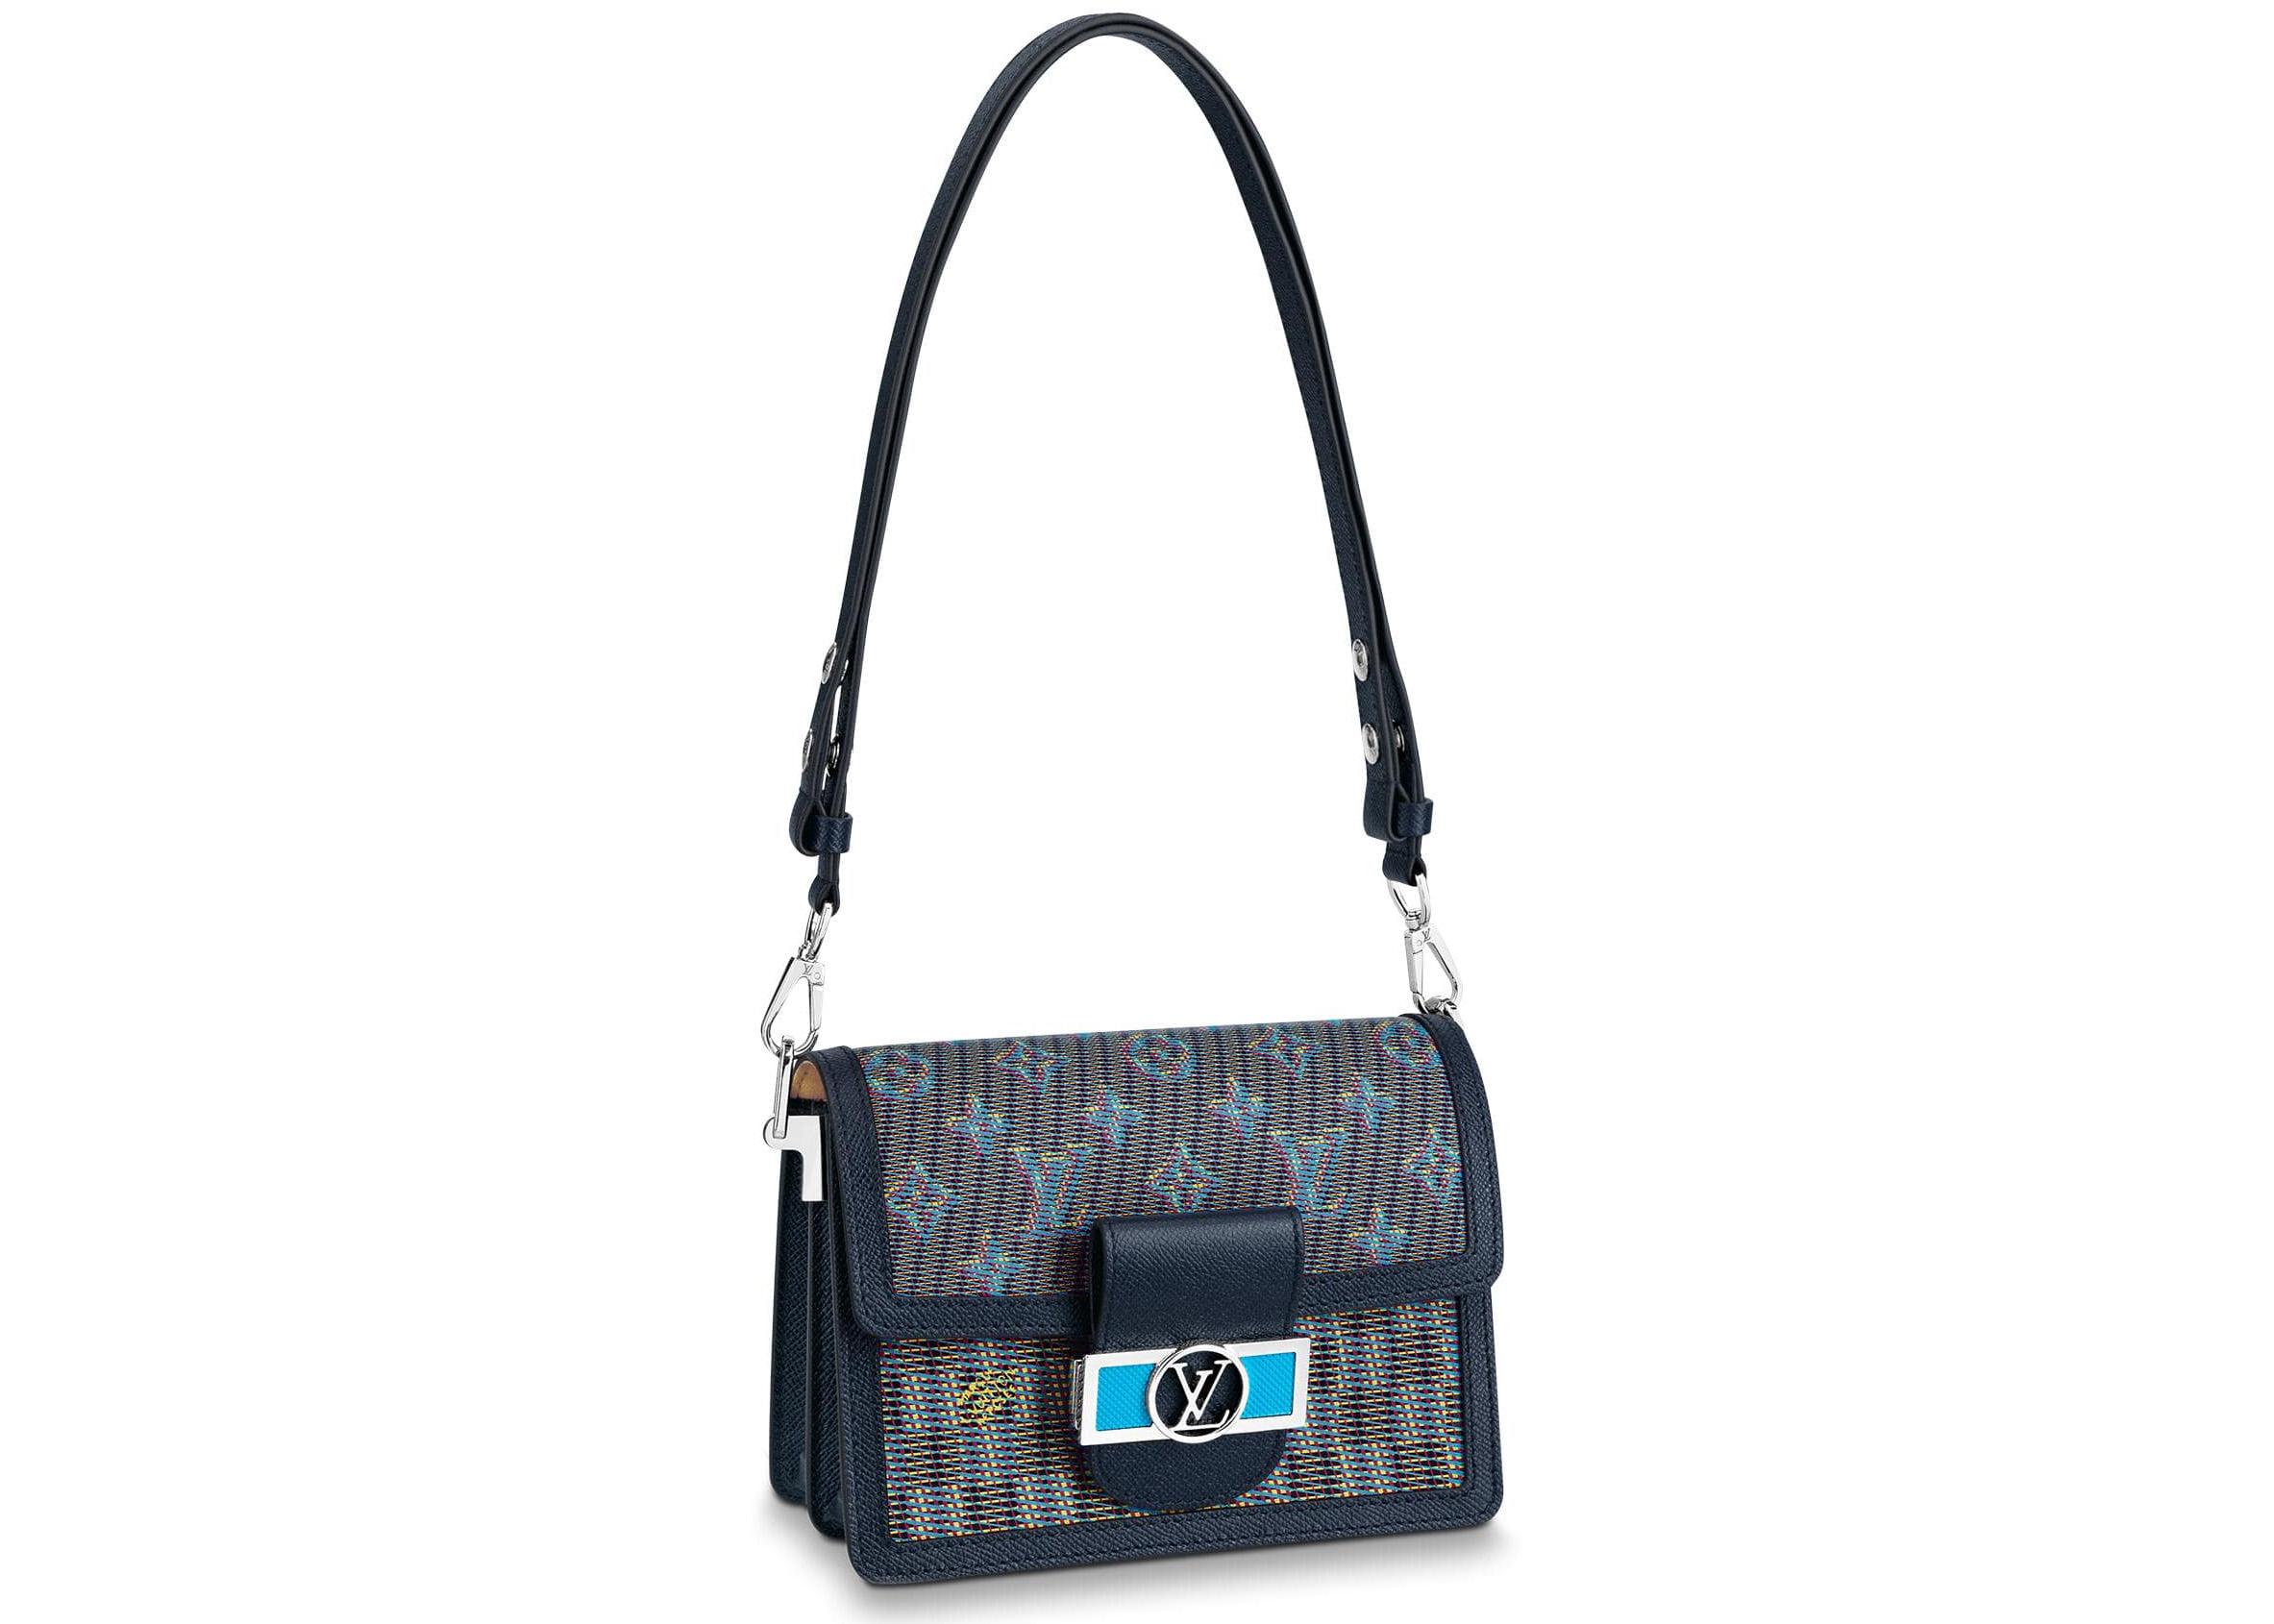 Louis Vuitton Mini Dauphine Damier Monogram Lv Pop Blue